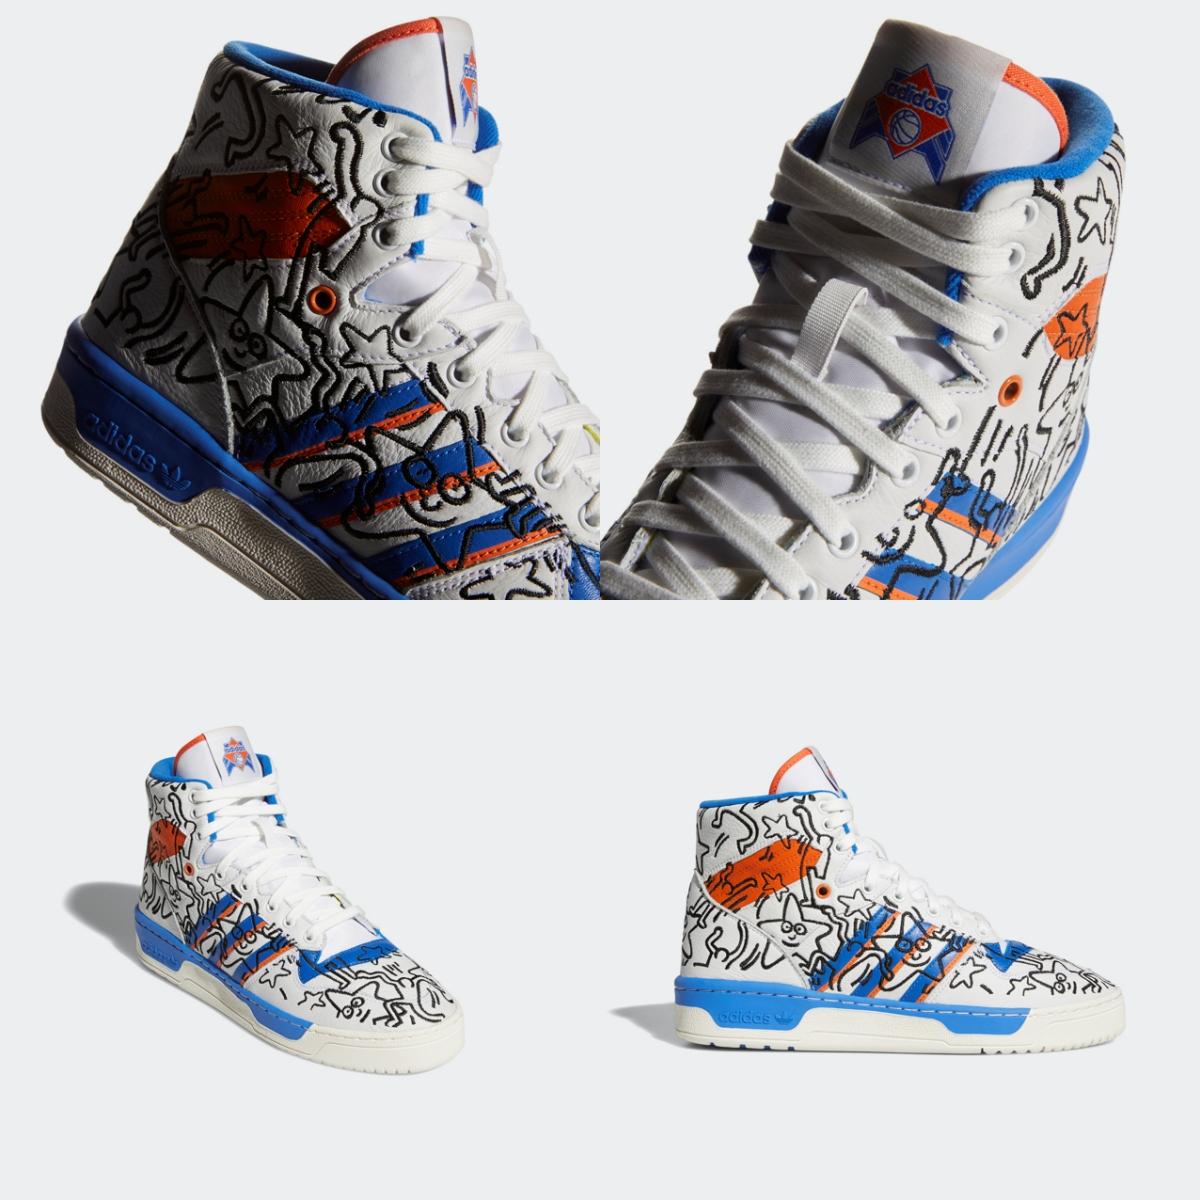 adidas, love unites, bộ sưu tập, pride month, lgbt, cộng đồng, keith haring